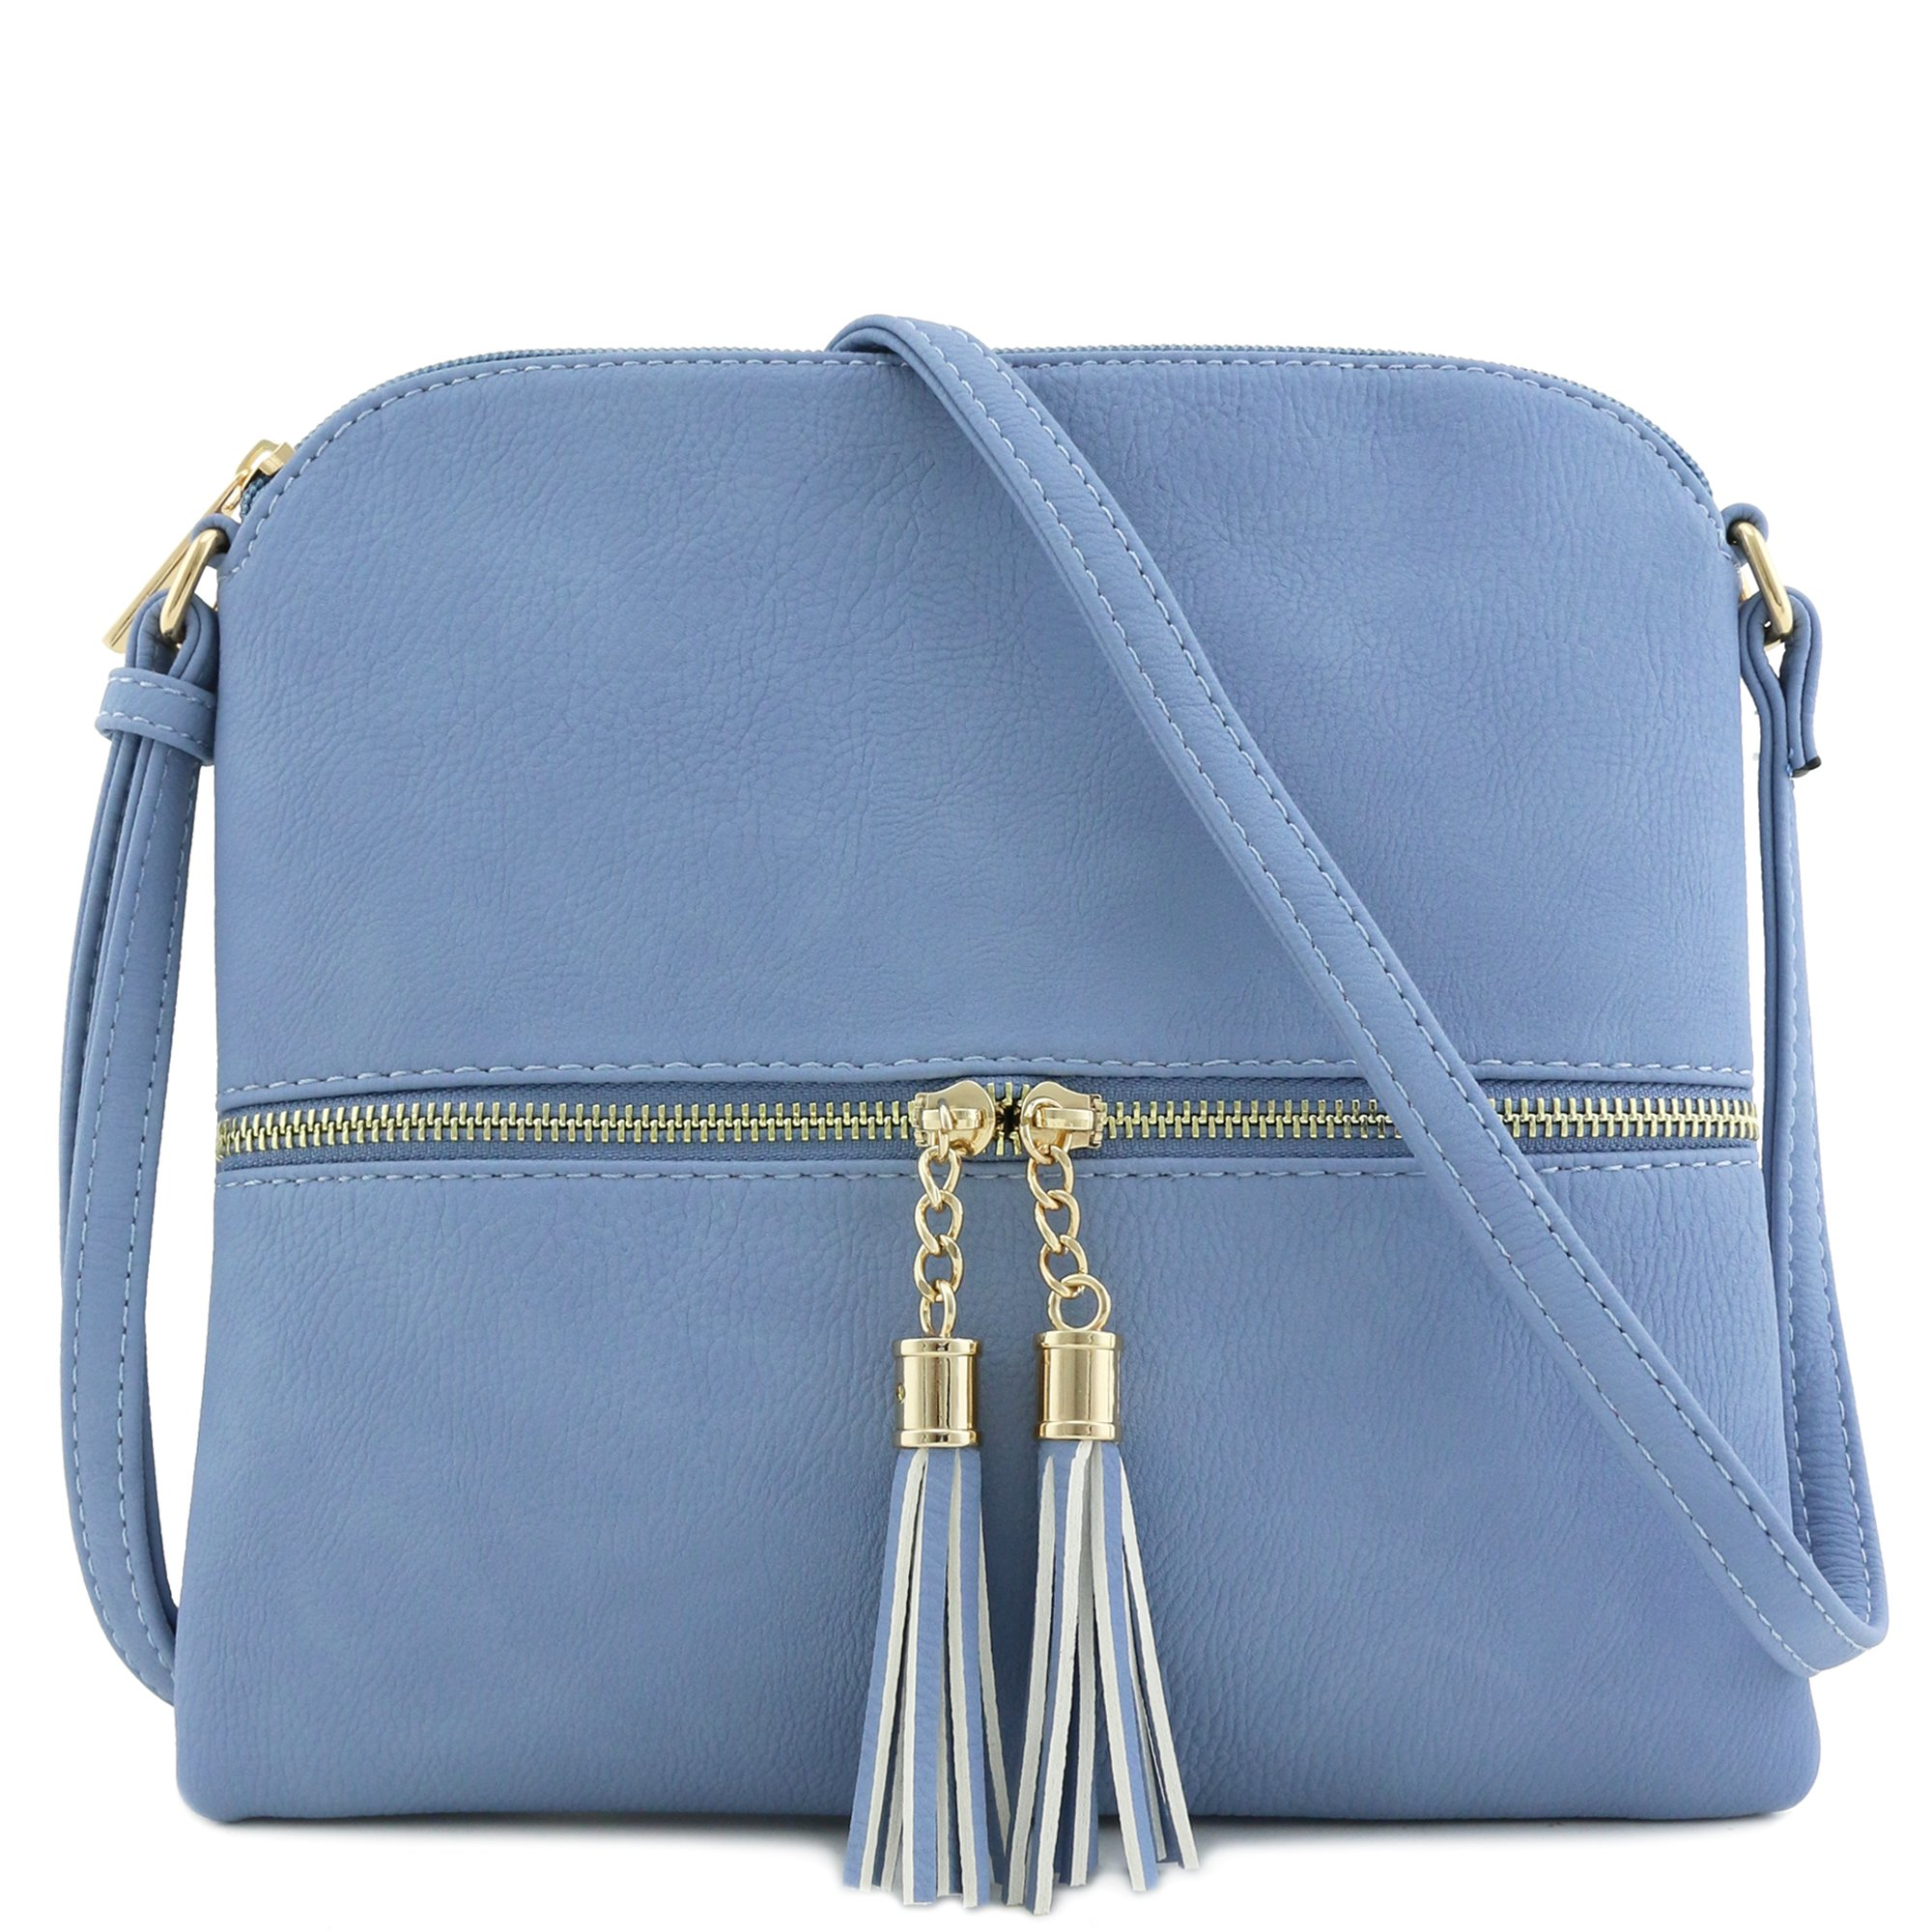 Lightweight Medium Crossbody Bag with Tassel (Light Blue)